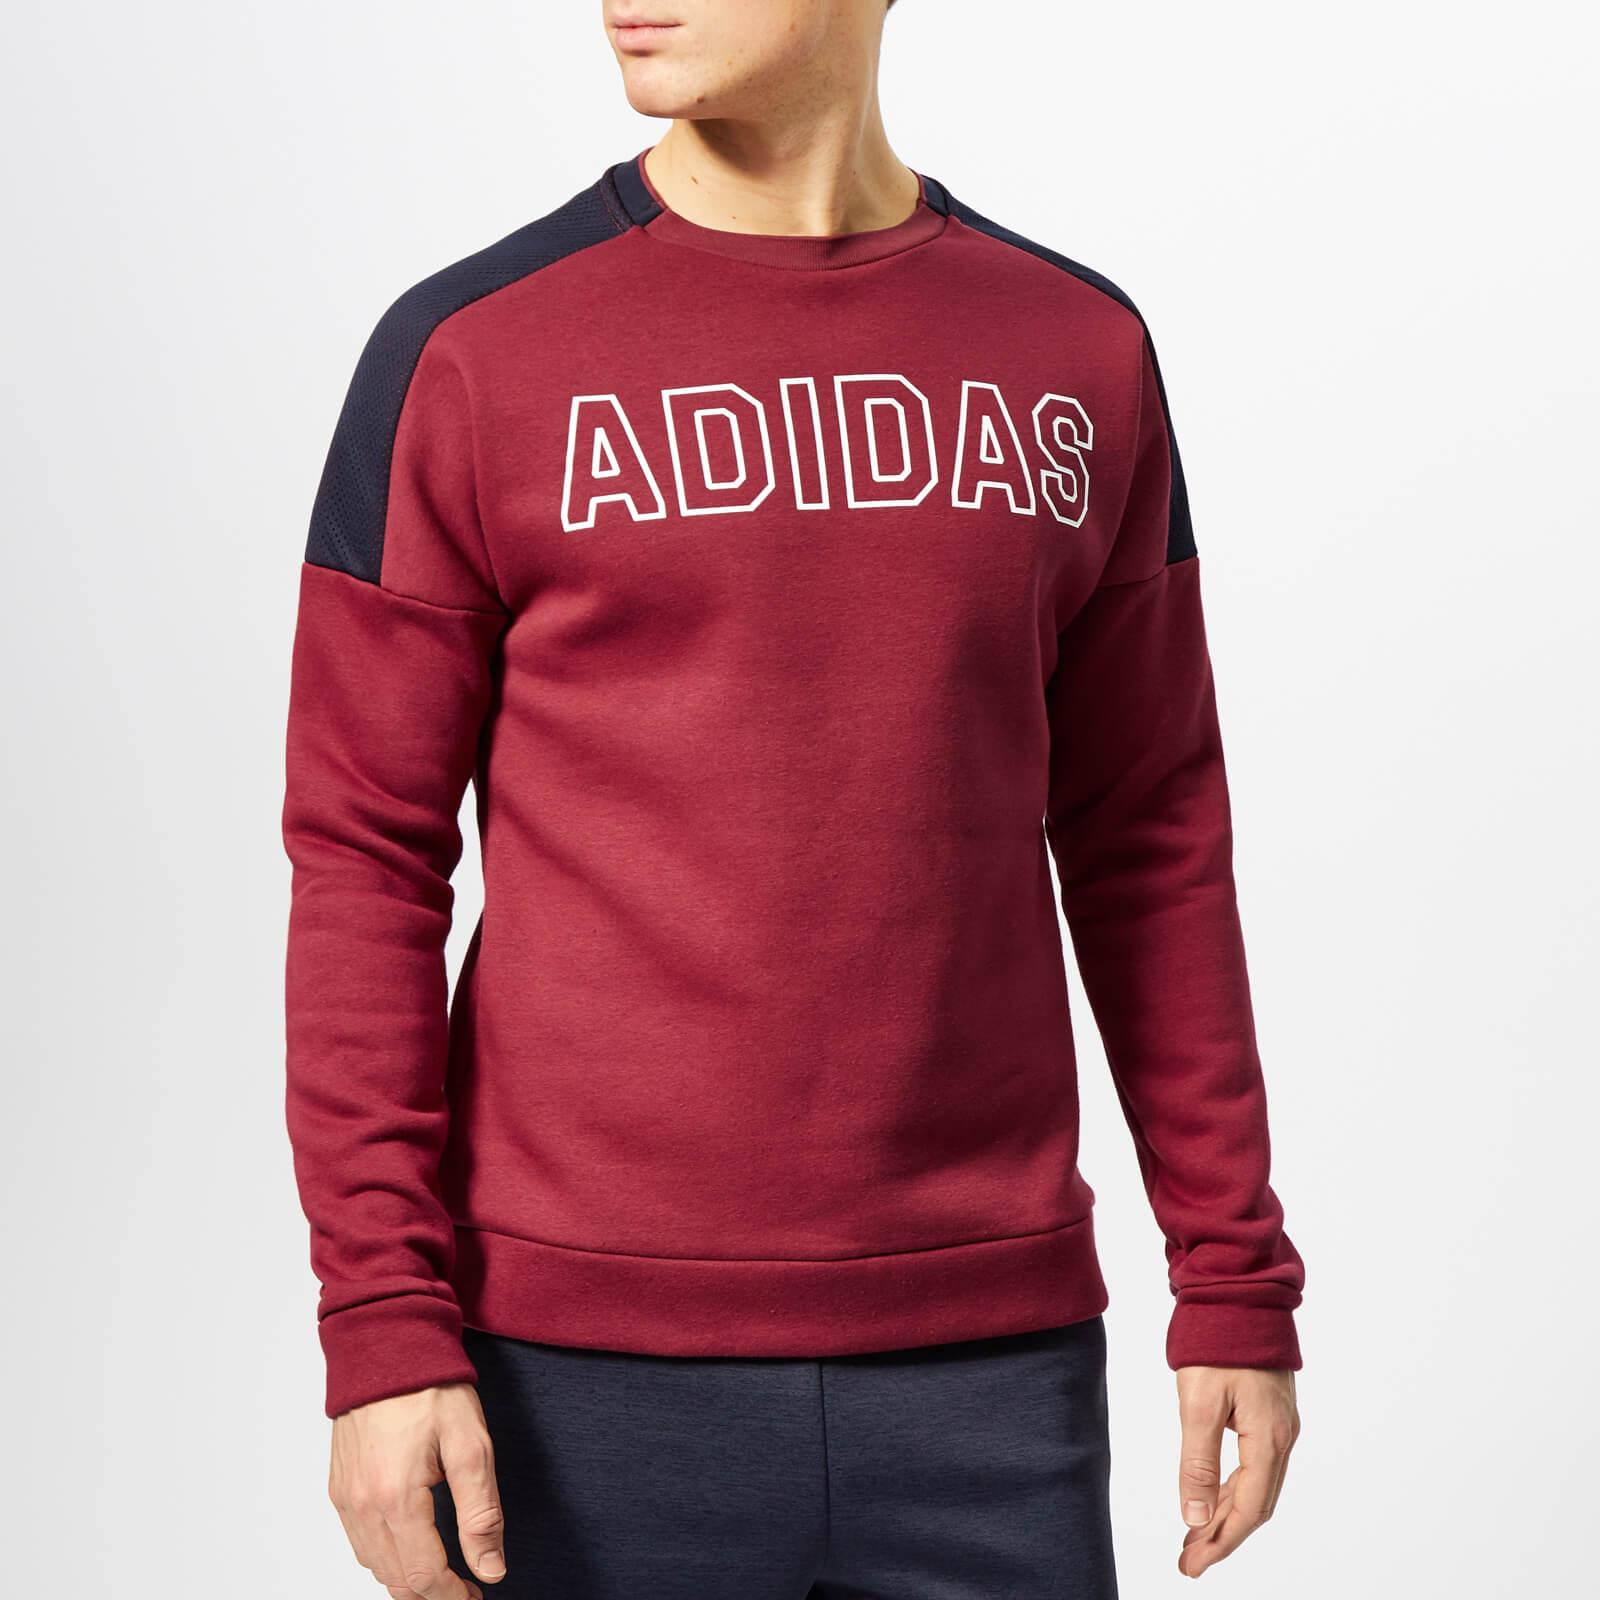 adidas Men's Sport ID Crew Neck Sweatshirt - Noble Maroon - XL - Red